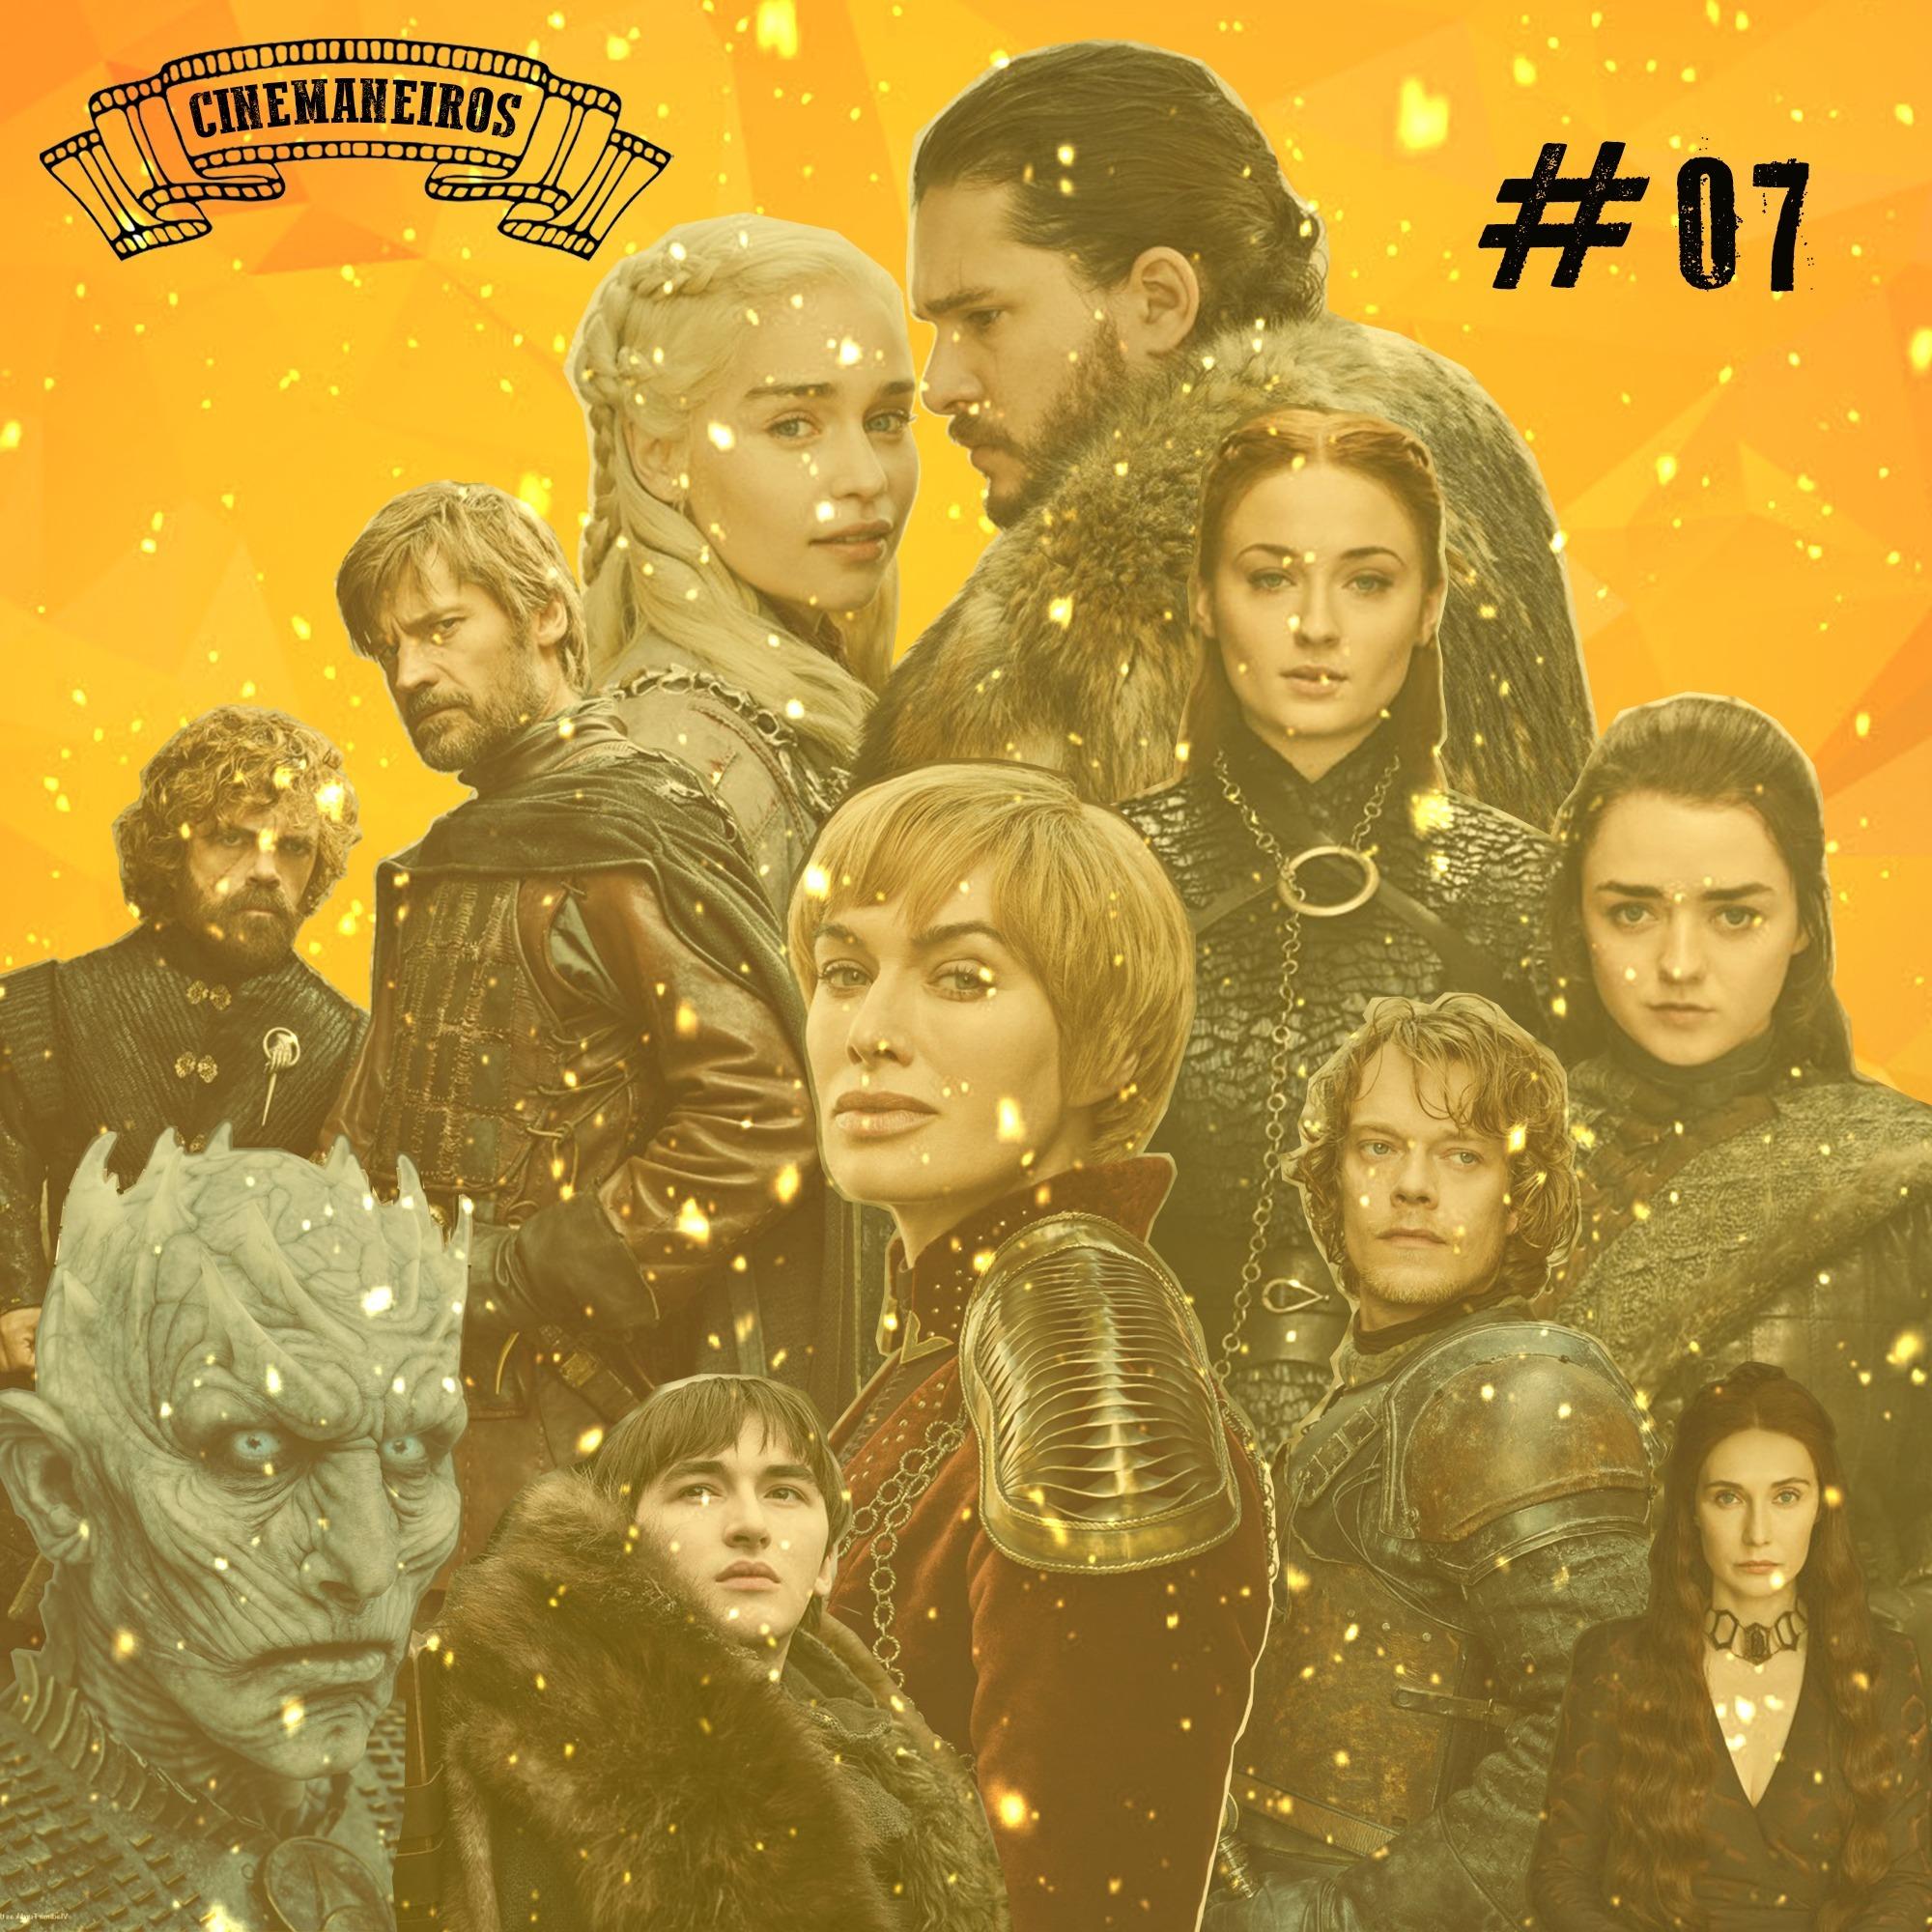 Cinemaneiros #07 Game Of Thrones